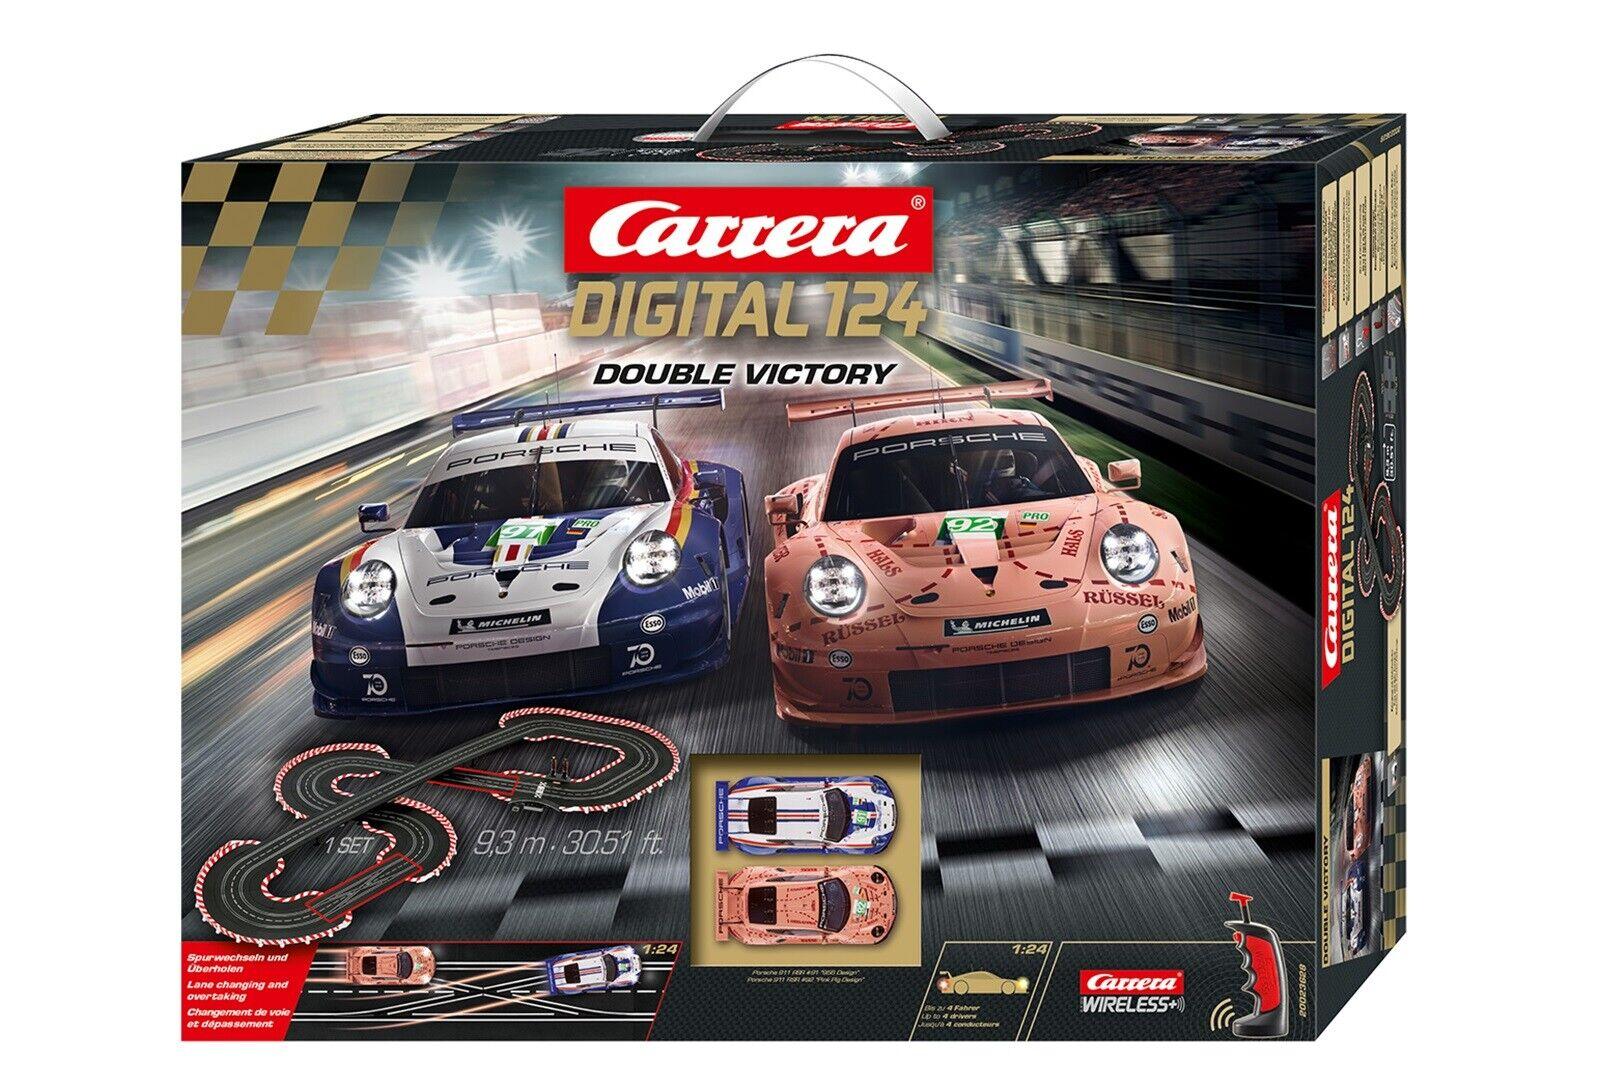 Carrera 23628 Digital 124 Double Victory NEU OVP